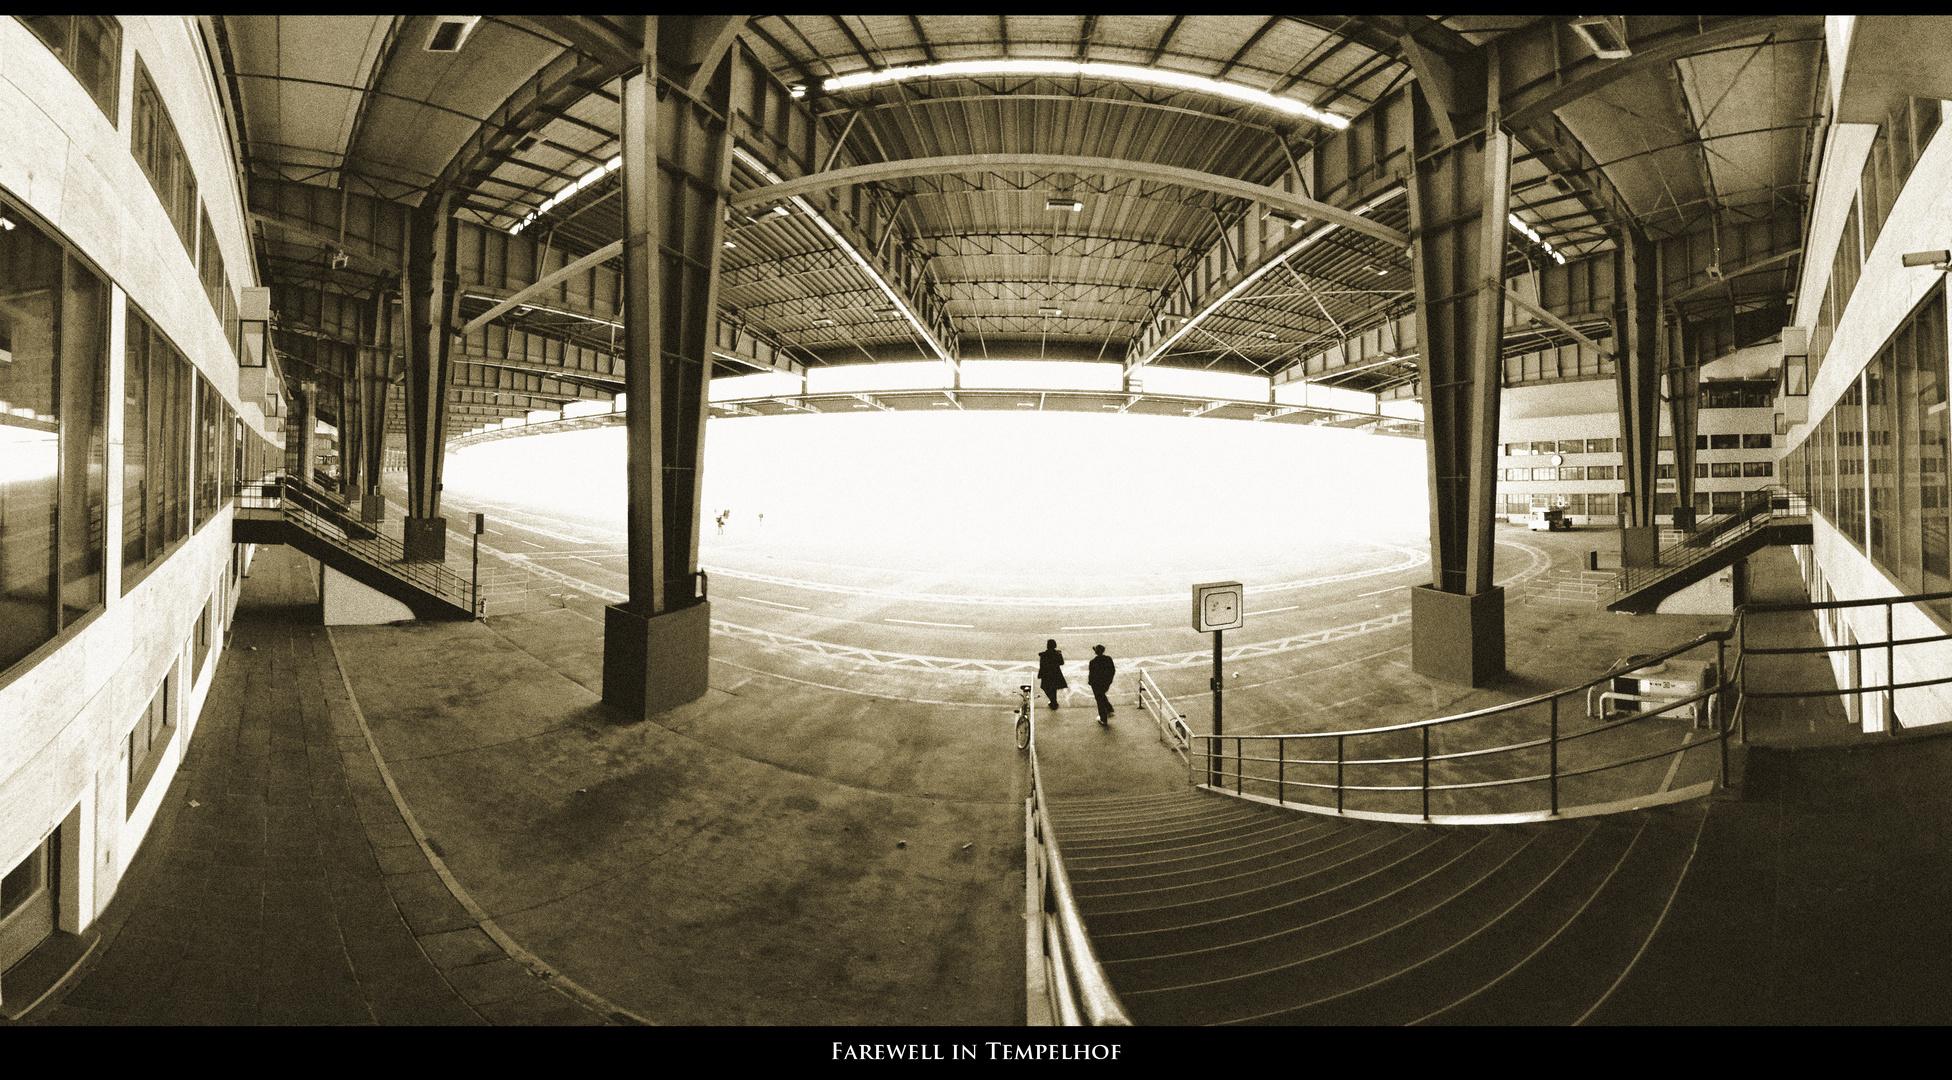 Farewell in Tempelhof